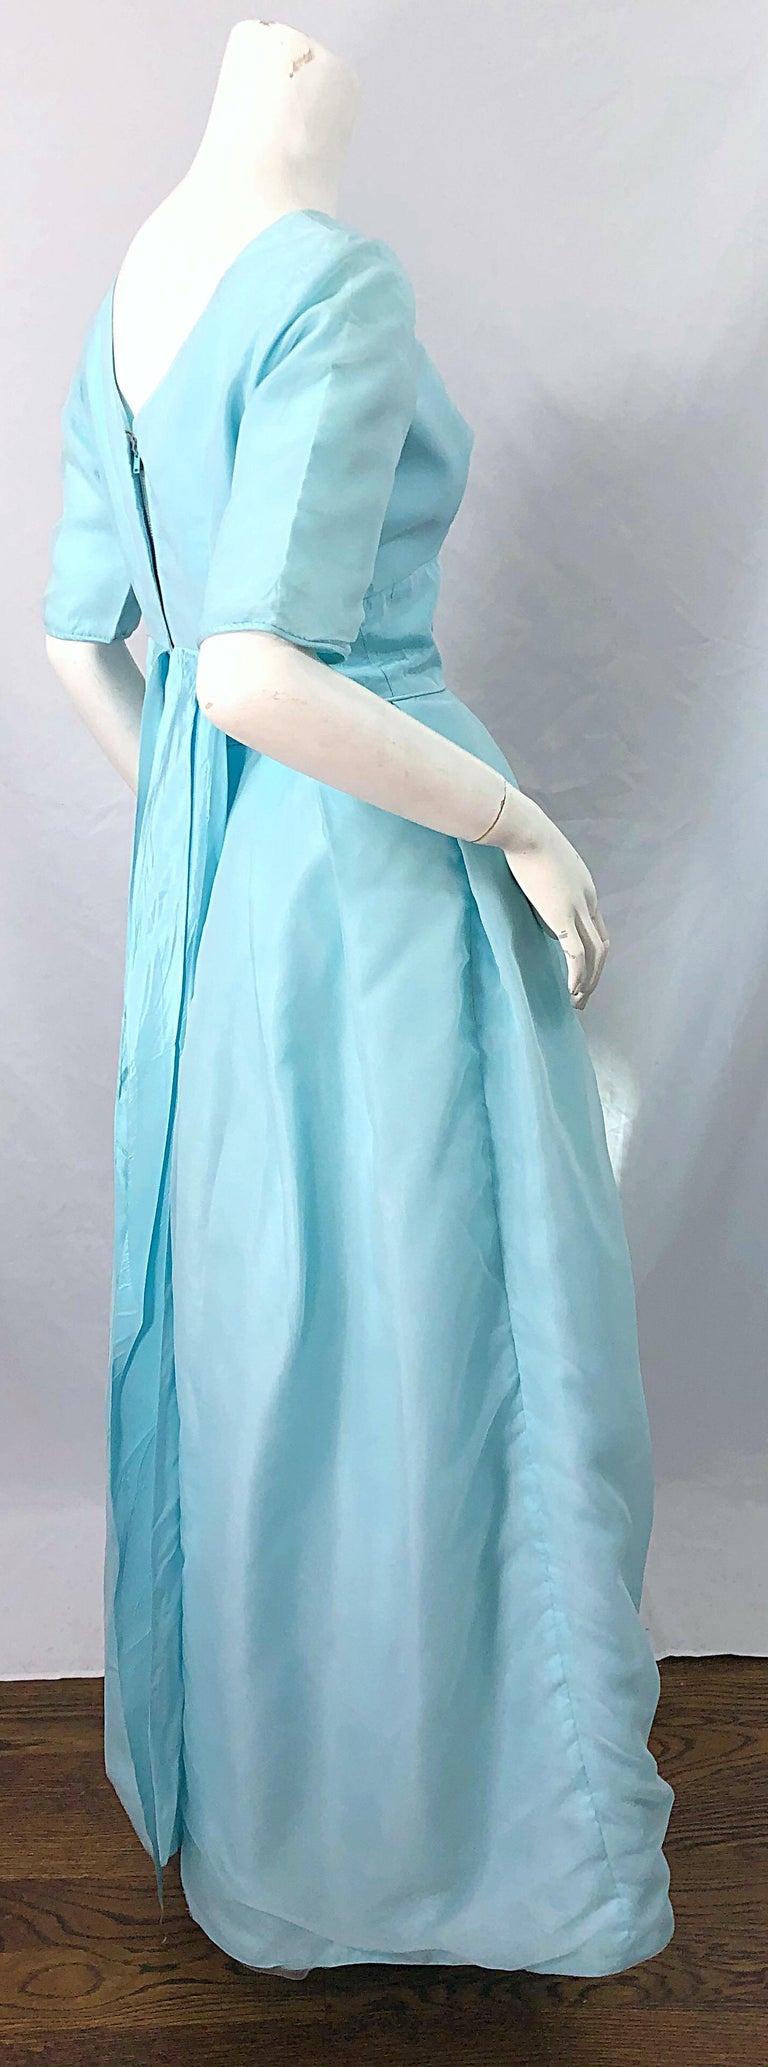 1950s Demi Couture Light Blue Cinderella Silk Chiffon Taffeta 3/4 Sleeves Gown For Sale 1